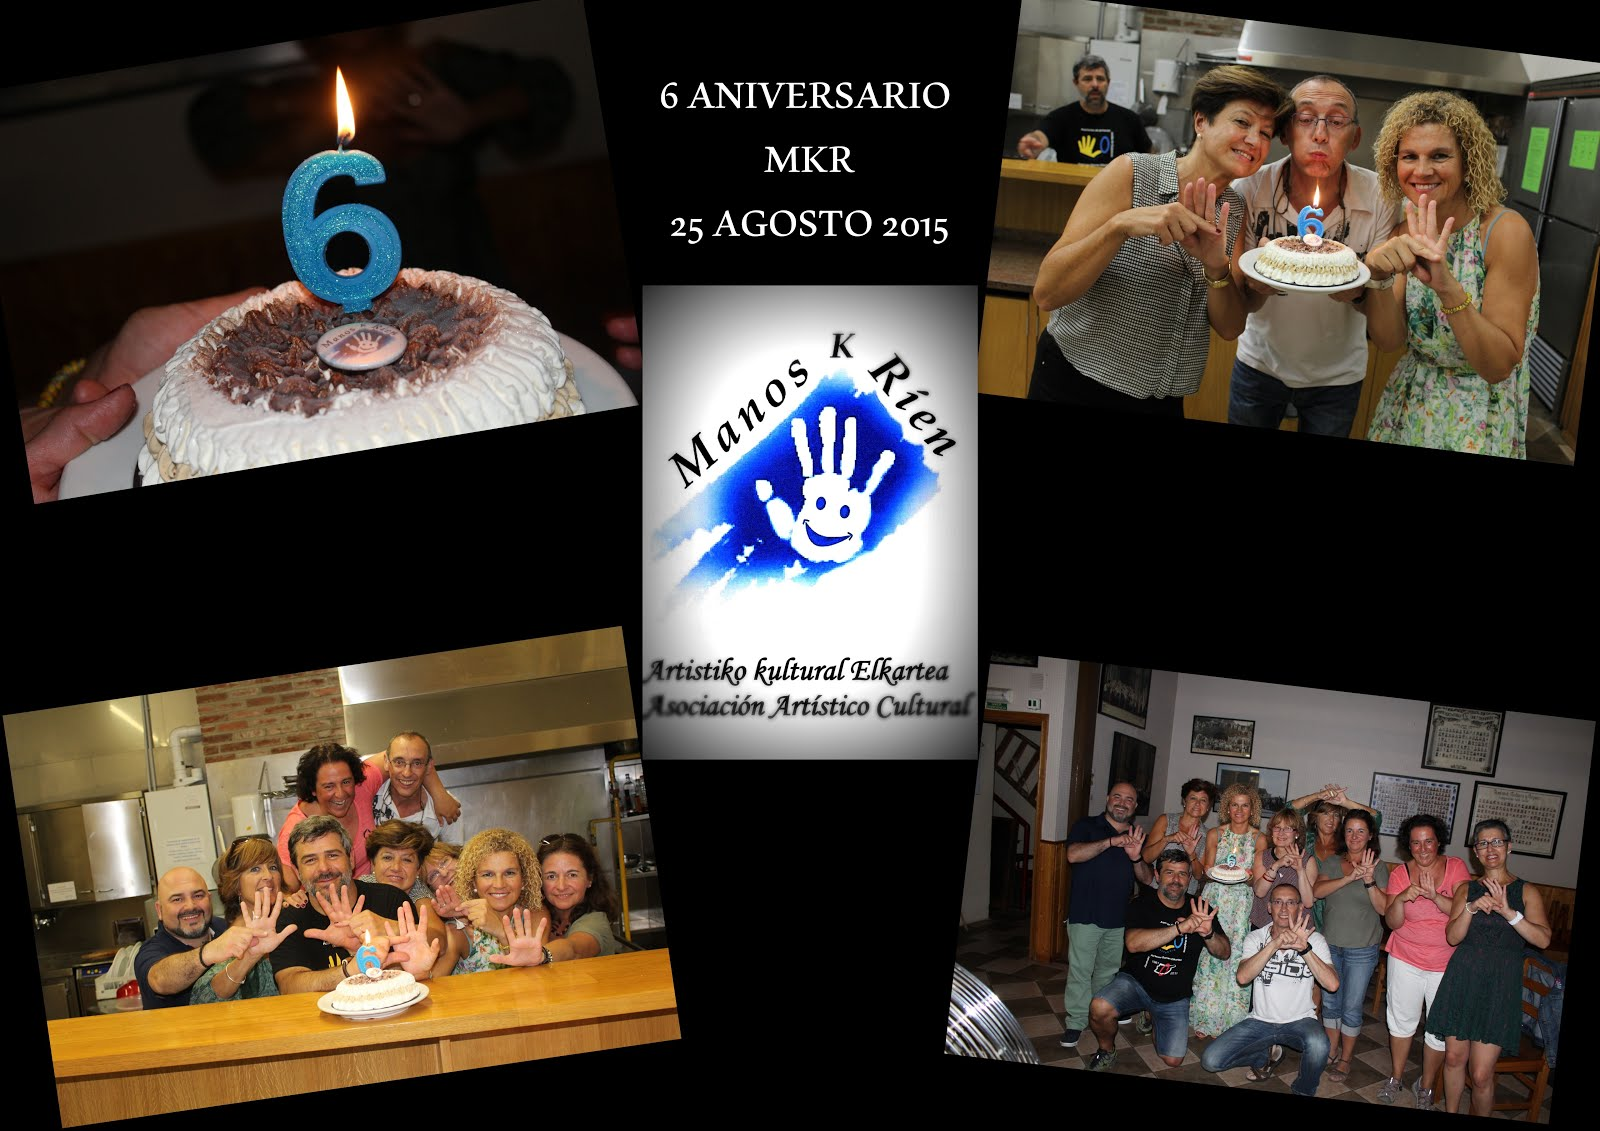 6 aniversario mkr